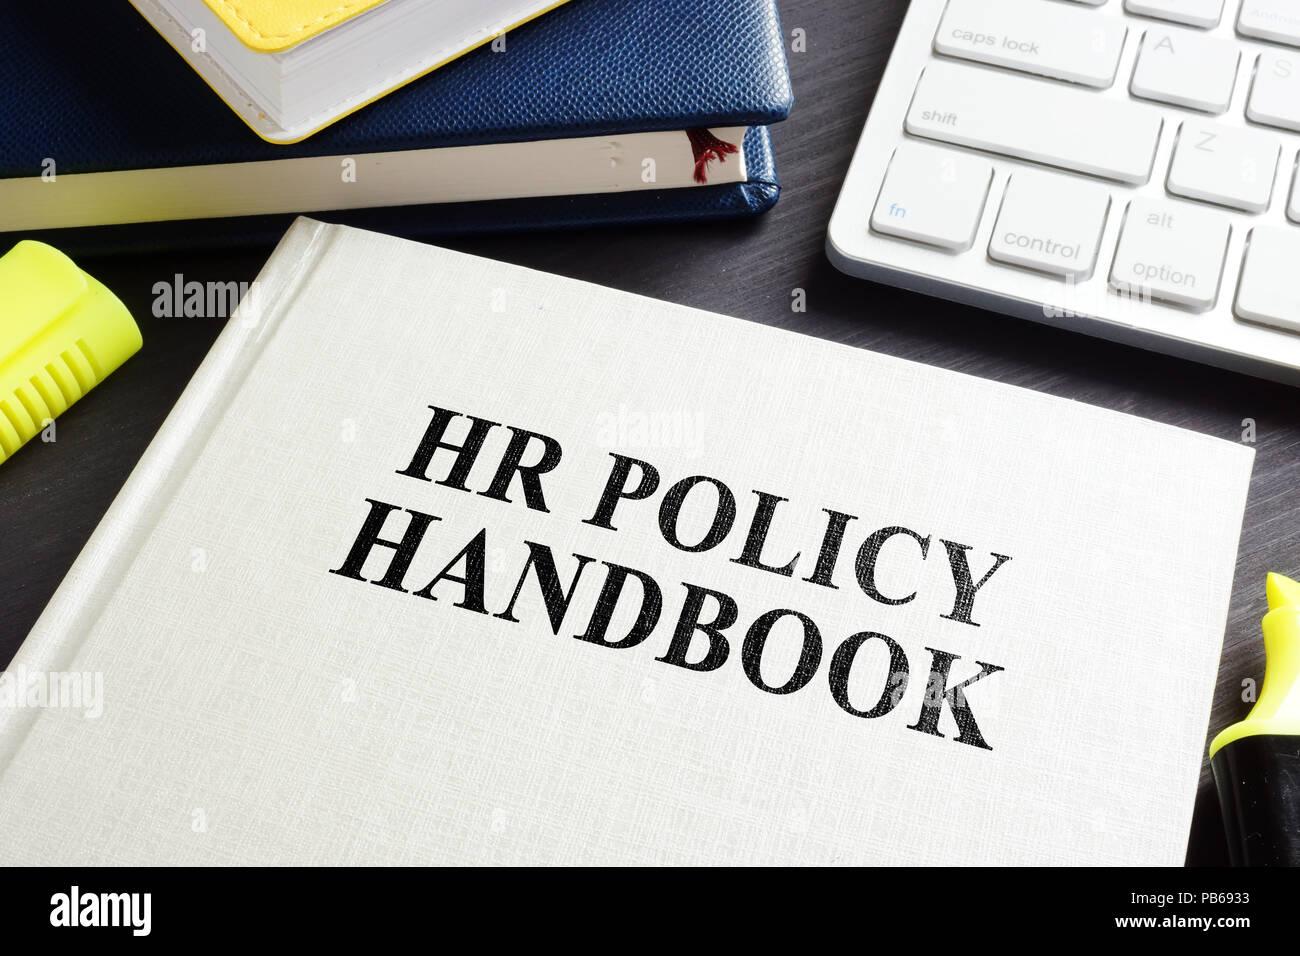 hr policy handbook on an office desk stock photo 213424487 alamy